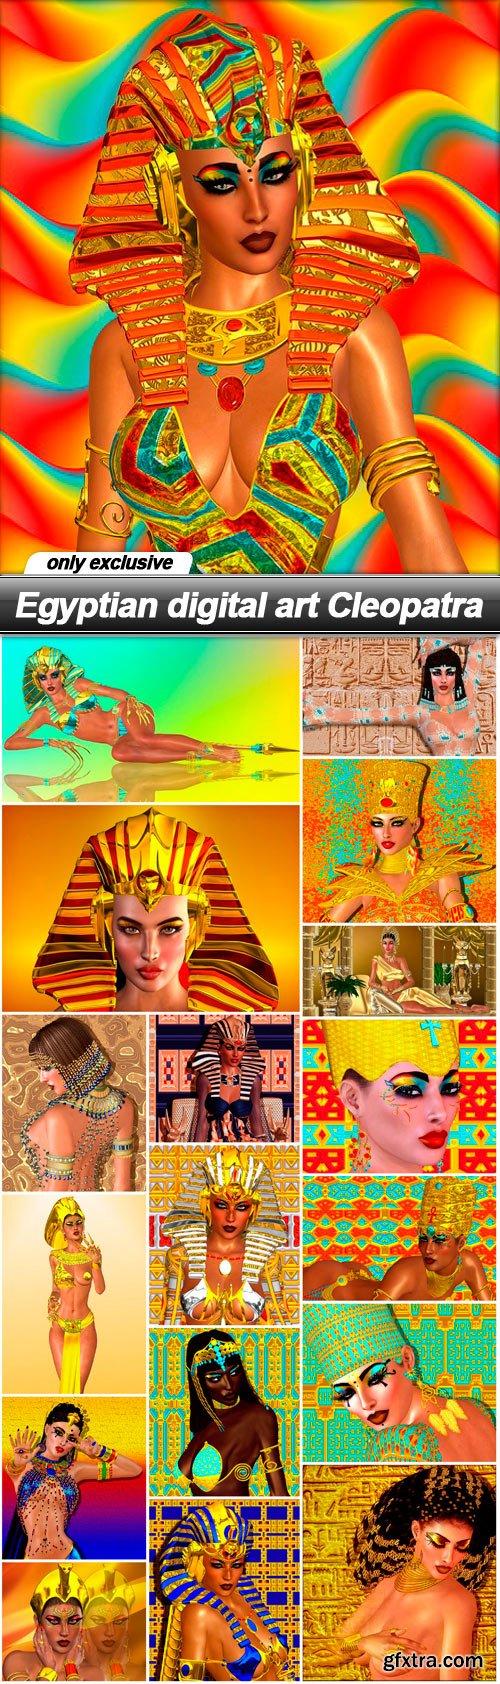 Egyptian digital art Cleopatra - 18 UHQ JPEG